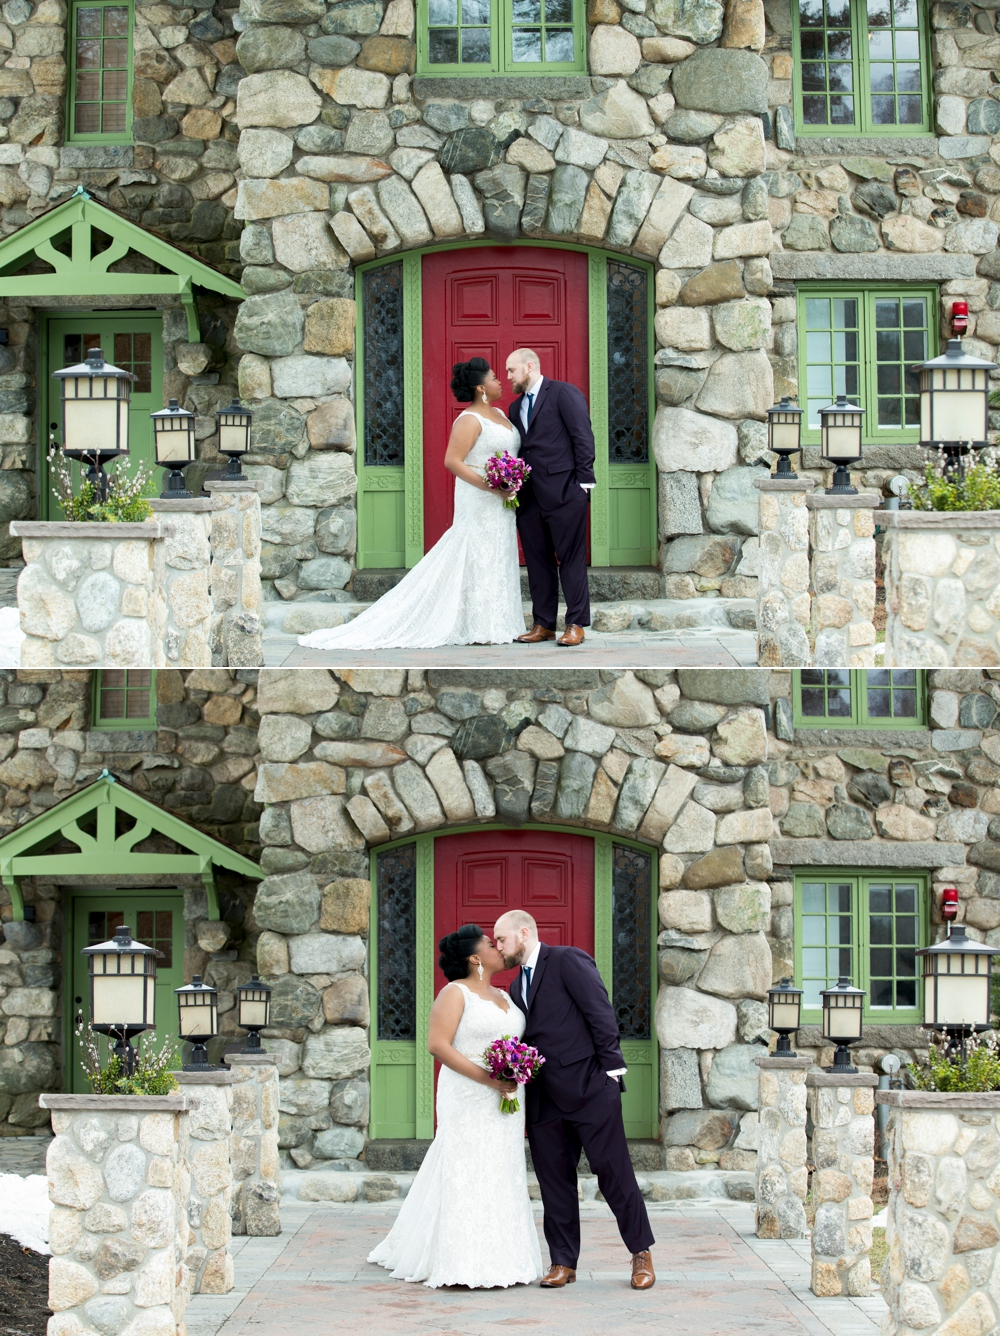 SomerbyJonesPhotography_WillowdaleWedding_Willowdale_Wedding_0038.jpg